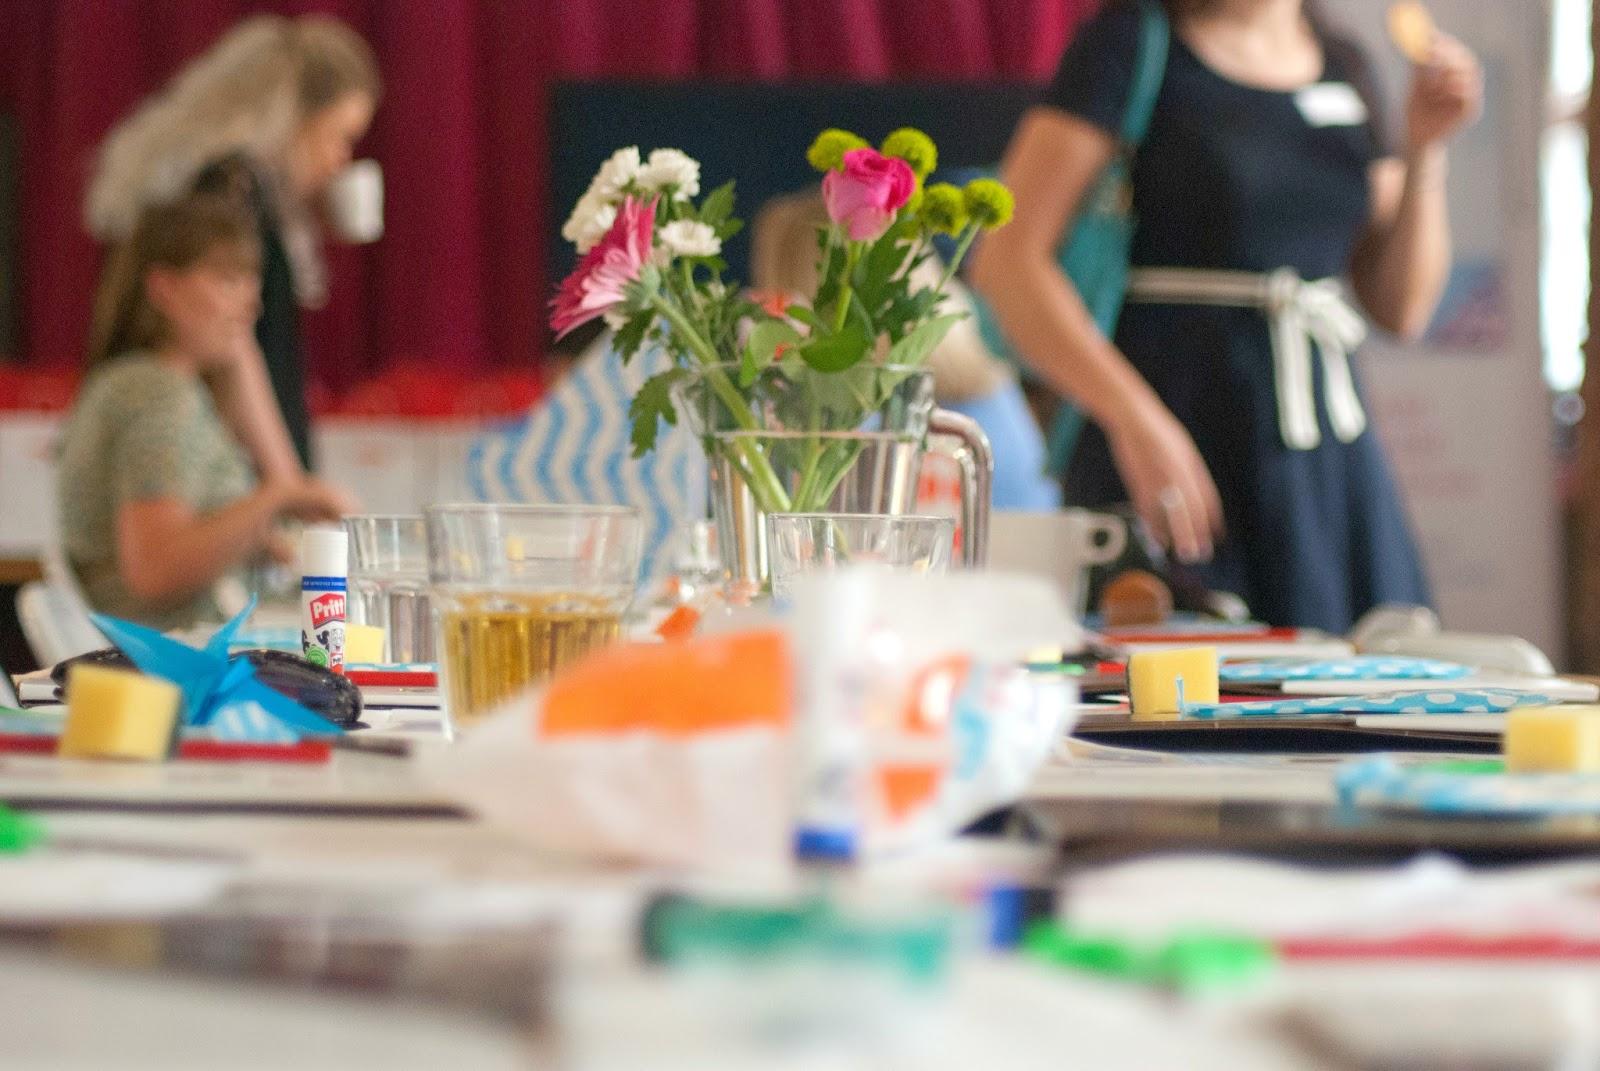 viking arty party lumiere london - 100 Ways to 30, block printing workshop,tea & crafting workshop, crafts, viking crafts, heather UK fashion & lifestyle blogger,